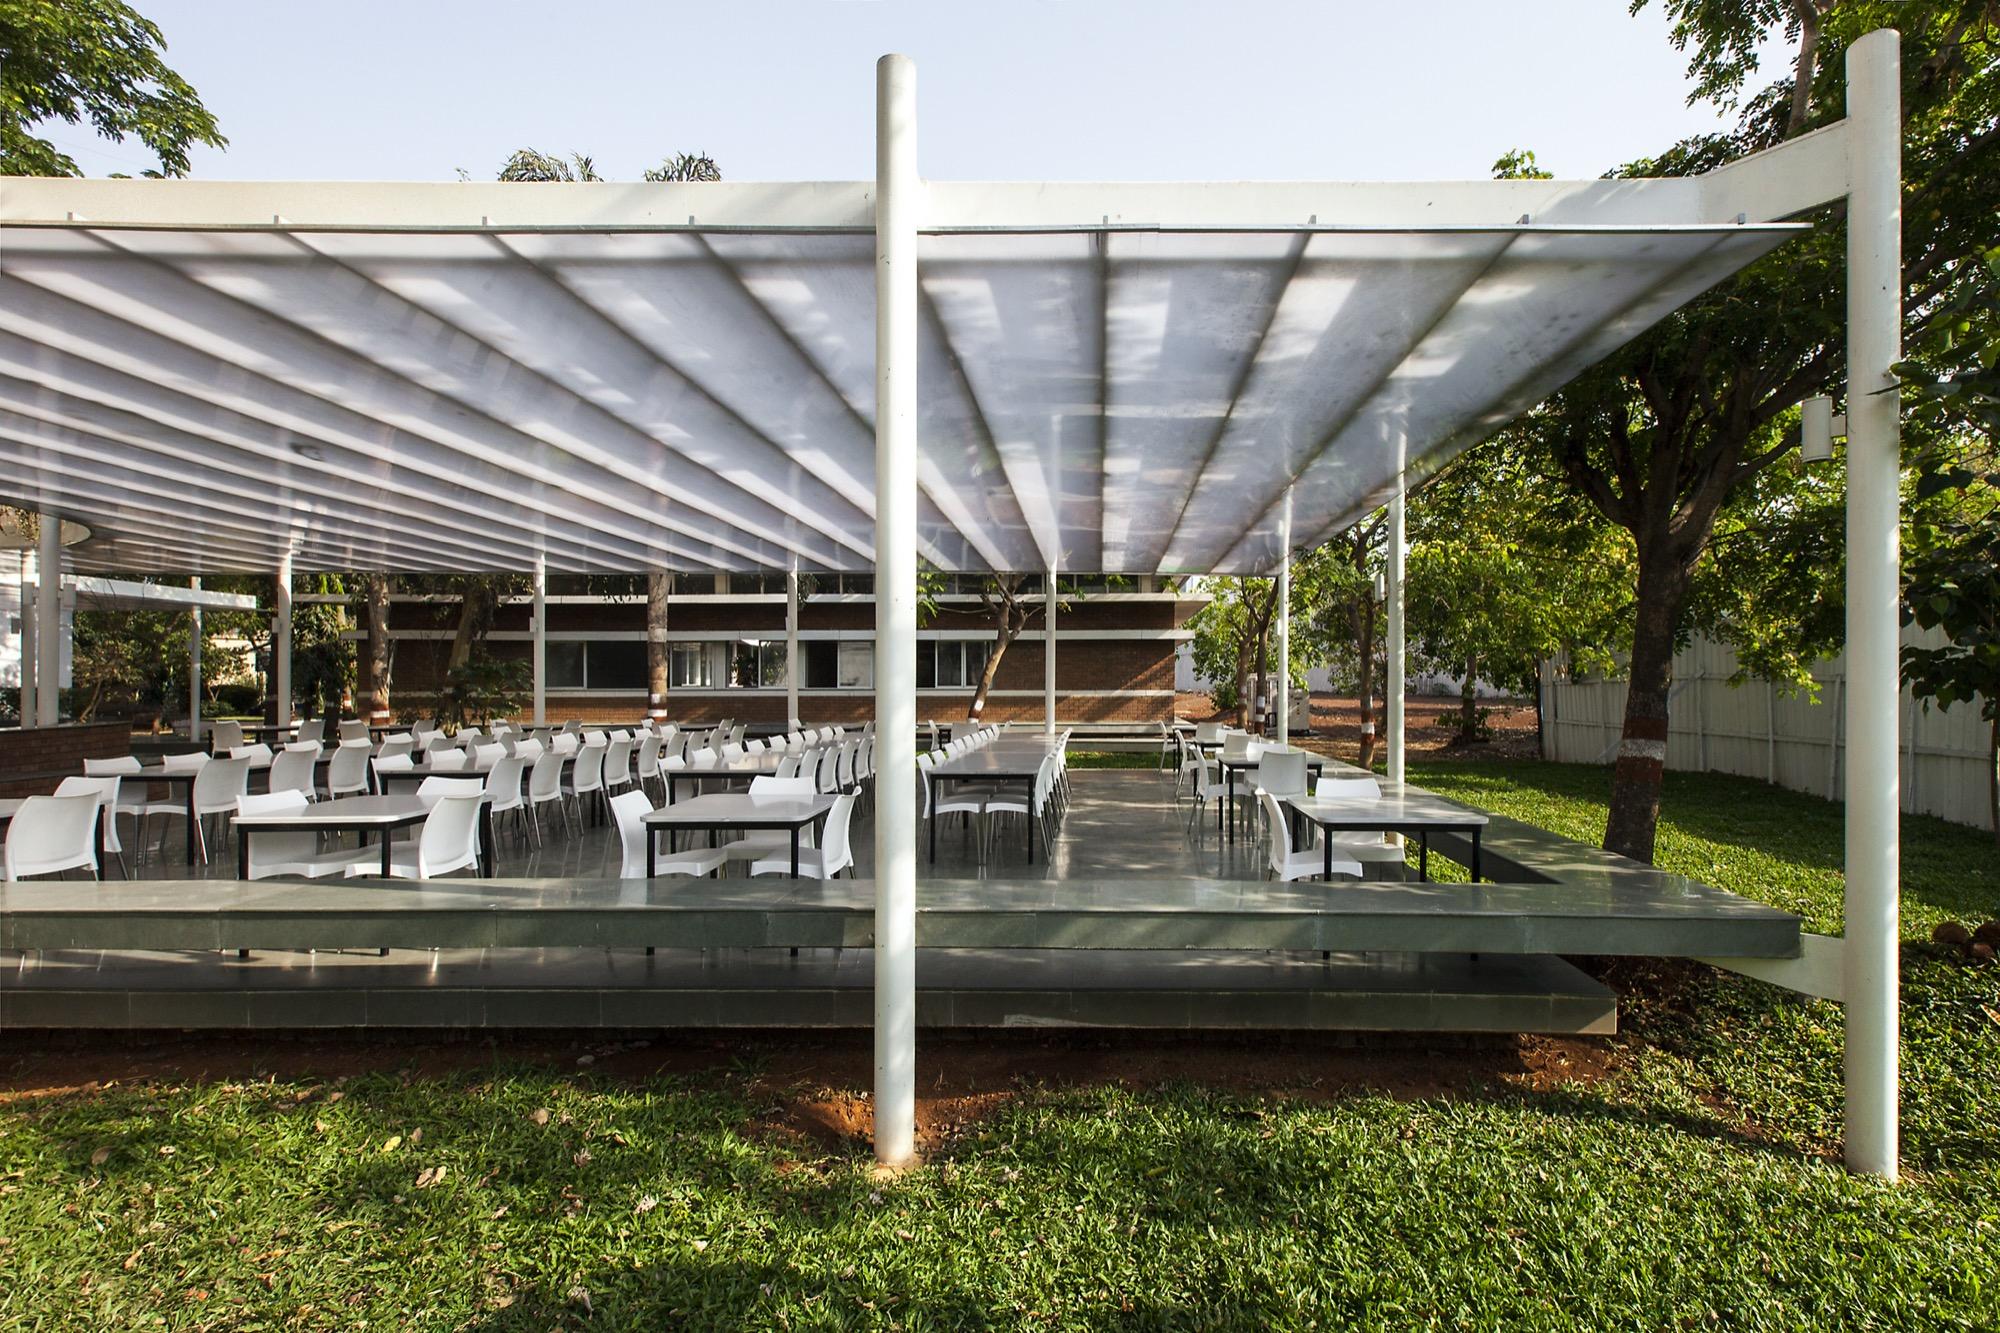 K.J. Somaiya IT Cafeteria Pavilion, by Sameep Padora and Associates